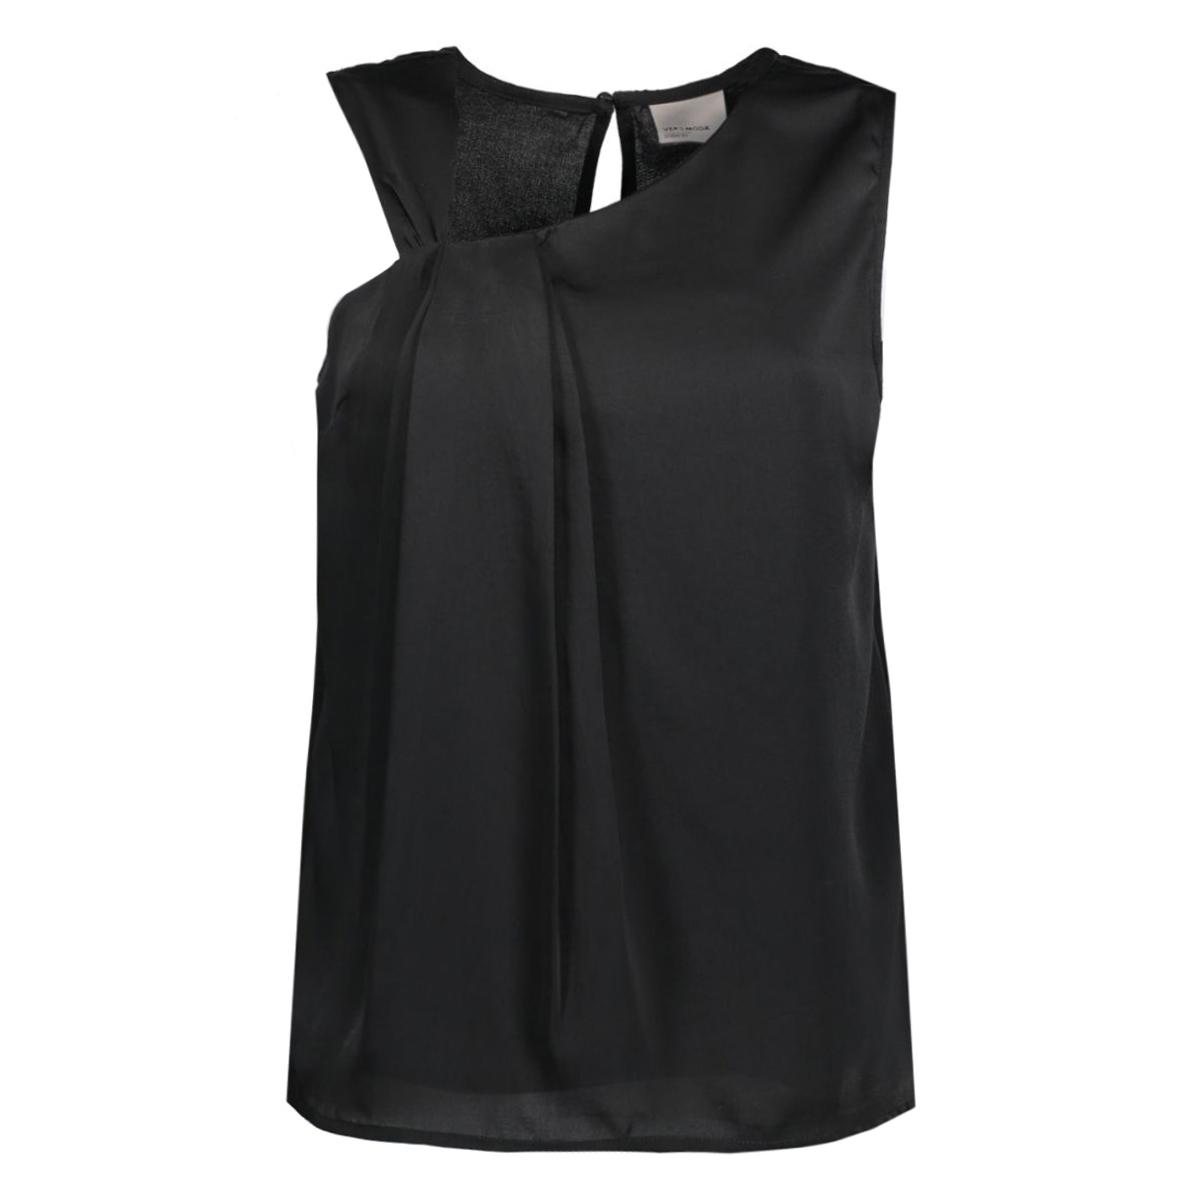 vmrotterdam s/l top nfs 10174866 vero moda top black